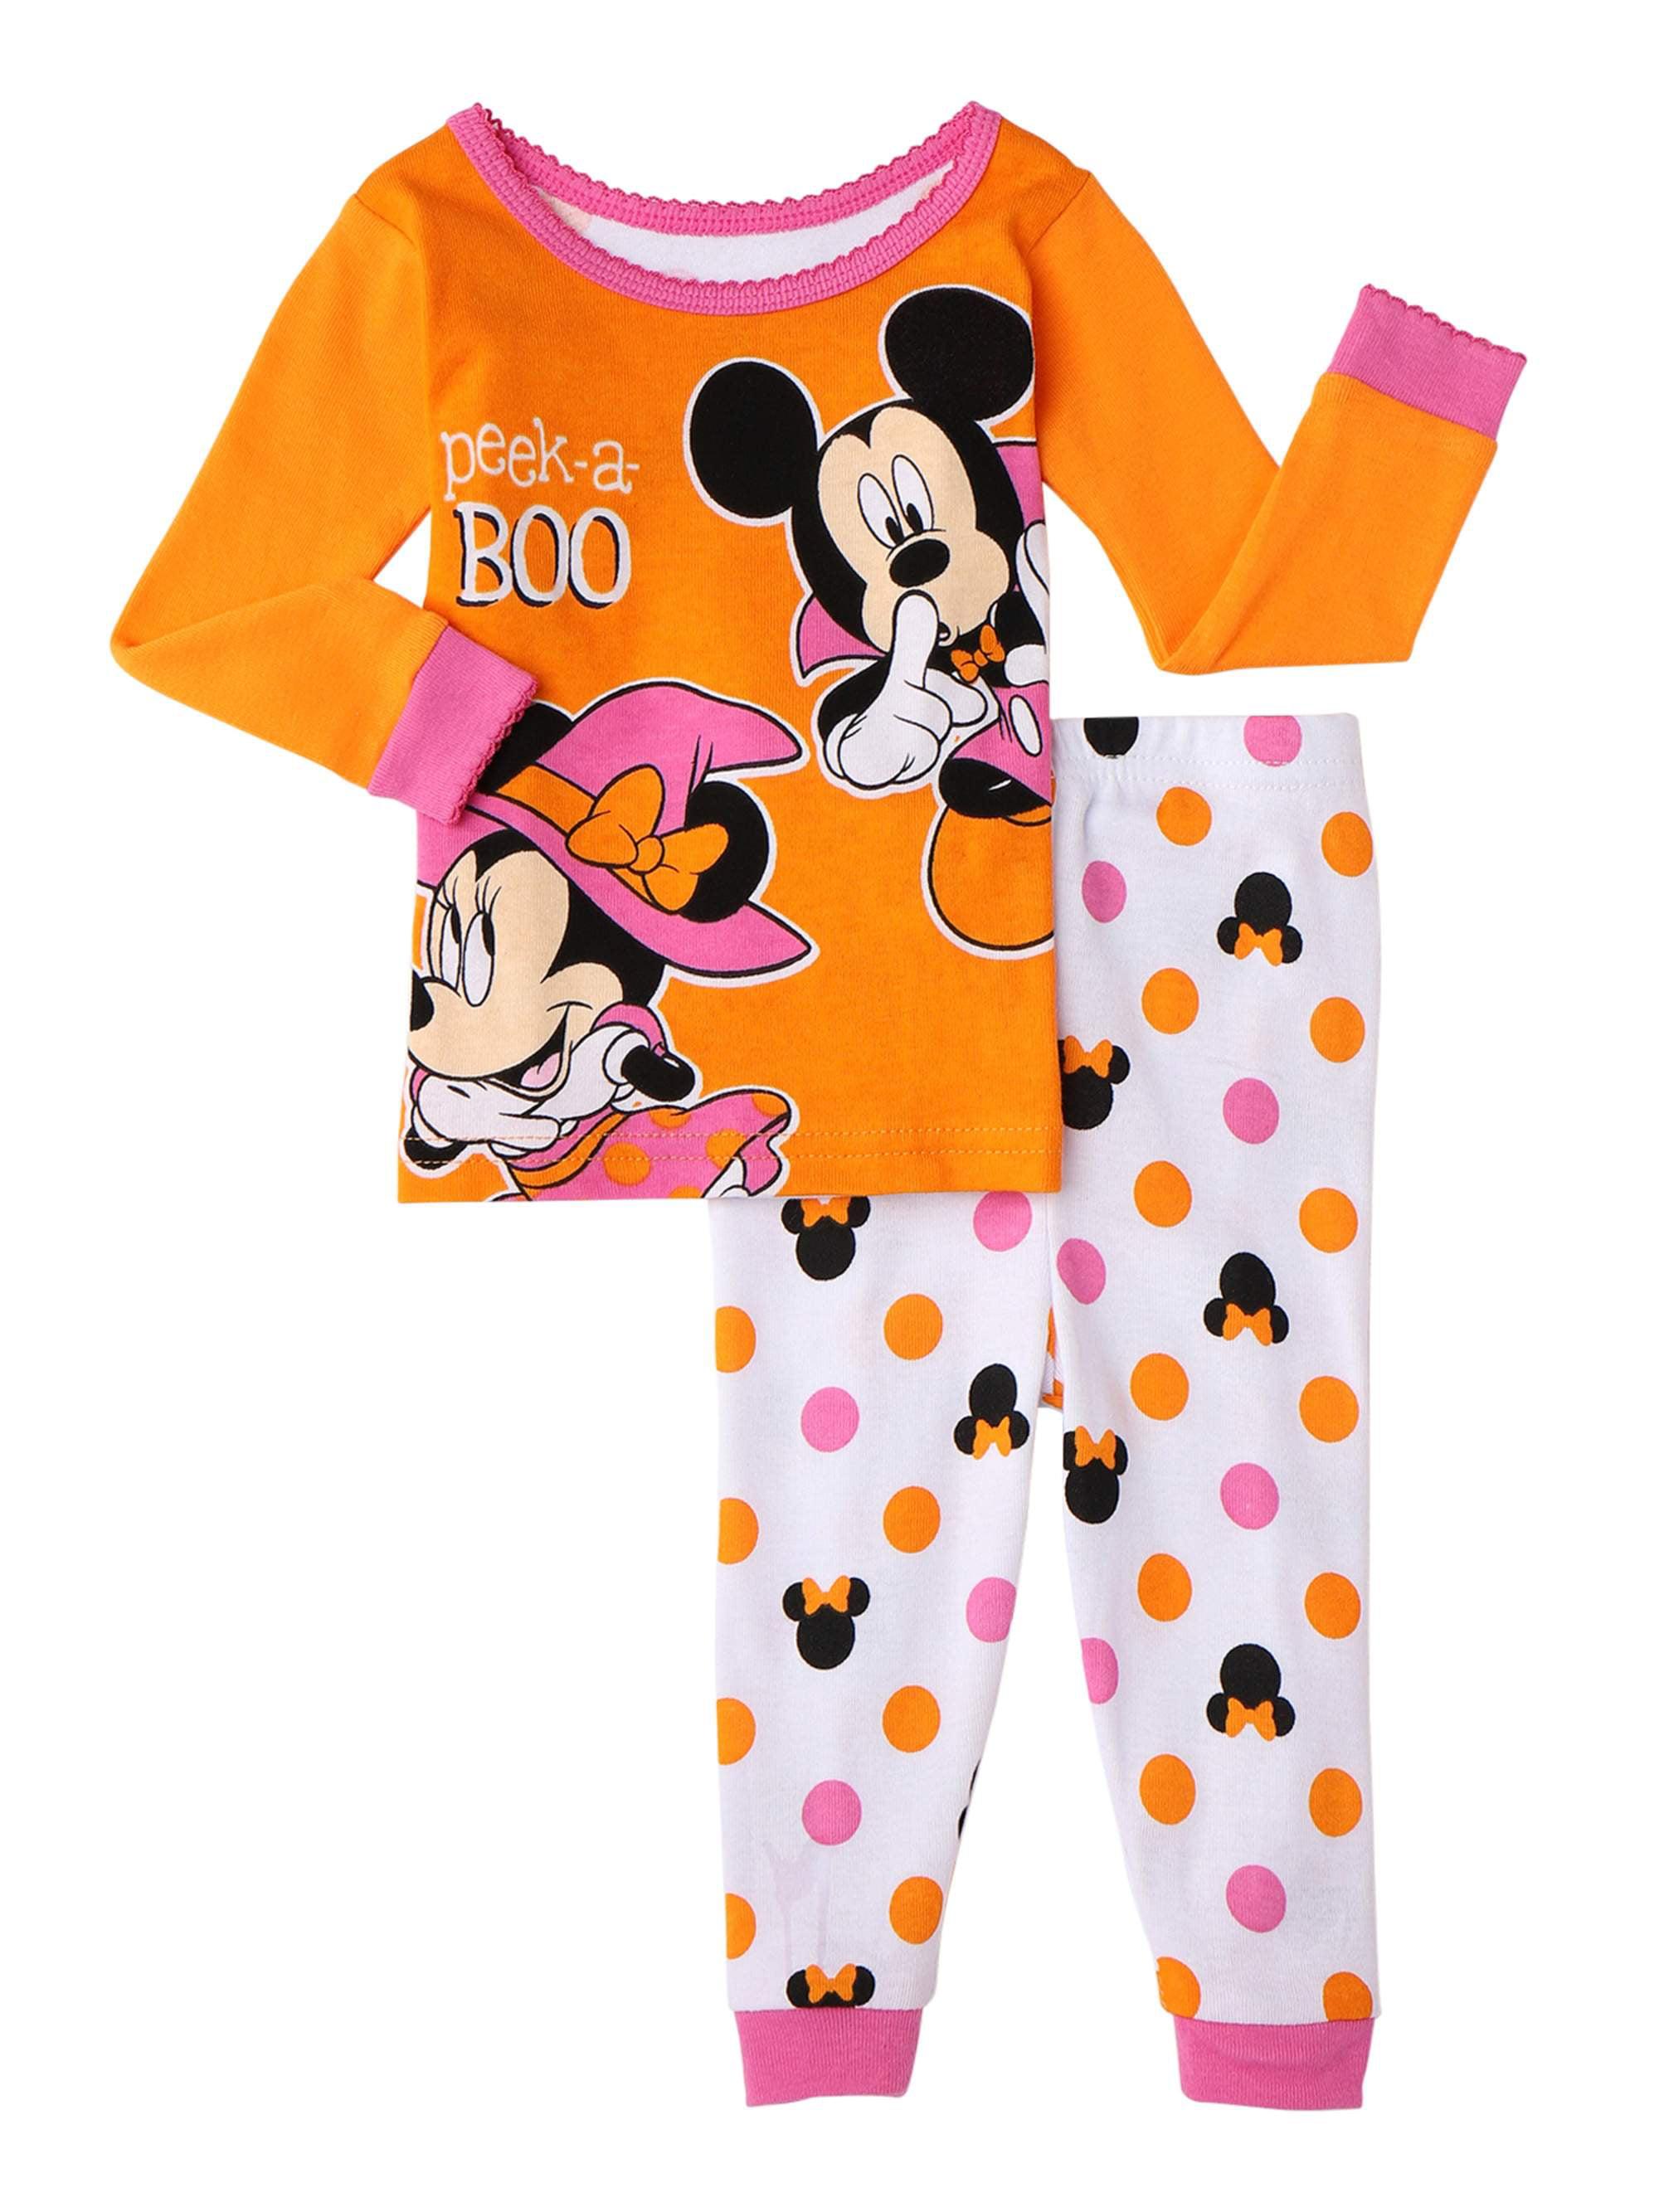 Seseme Street Peek A Boo Baby Girls 2 Piece Sleepwear Pajama Set